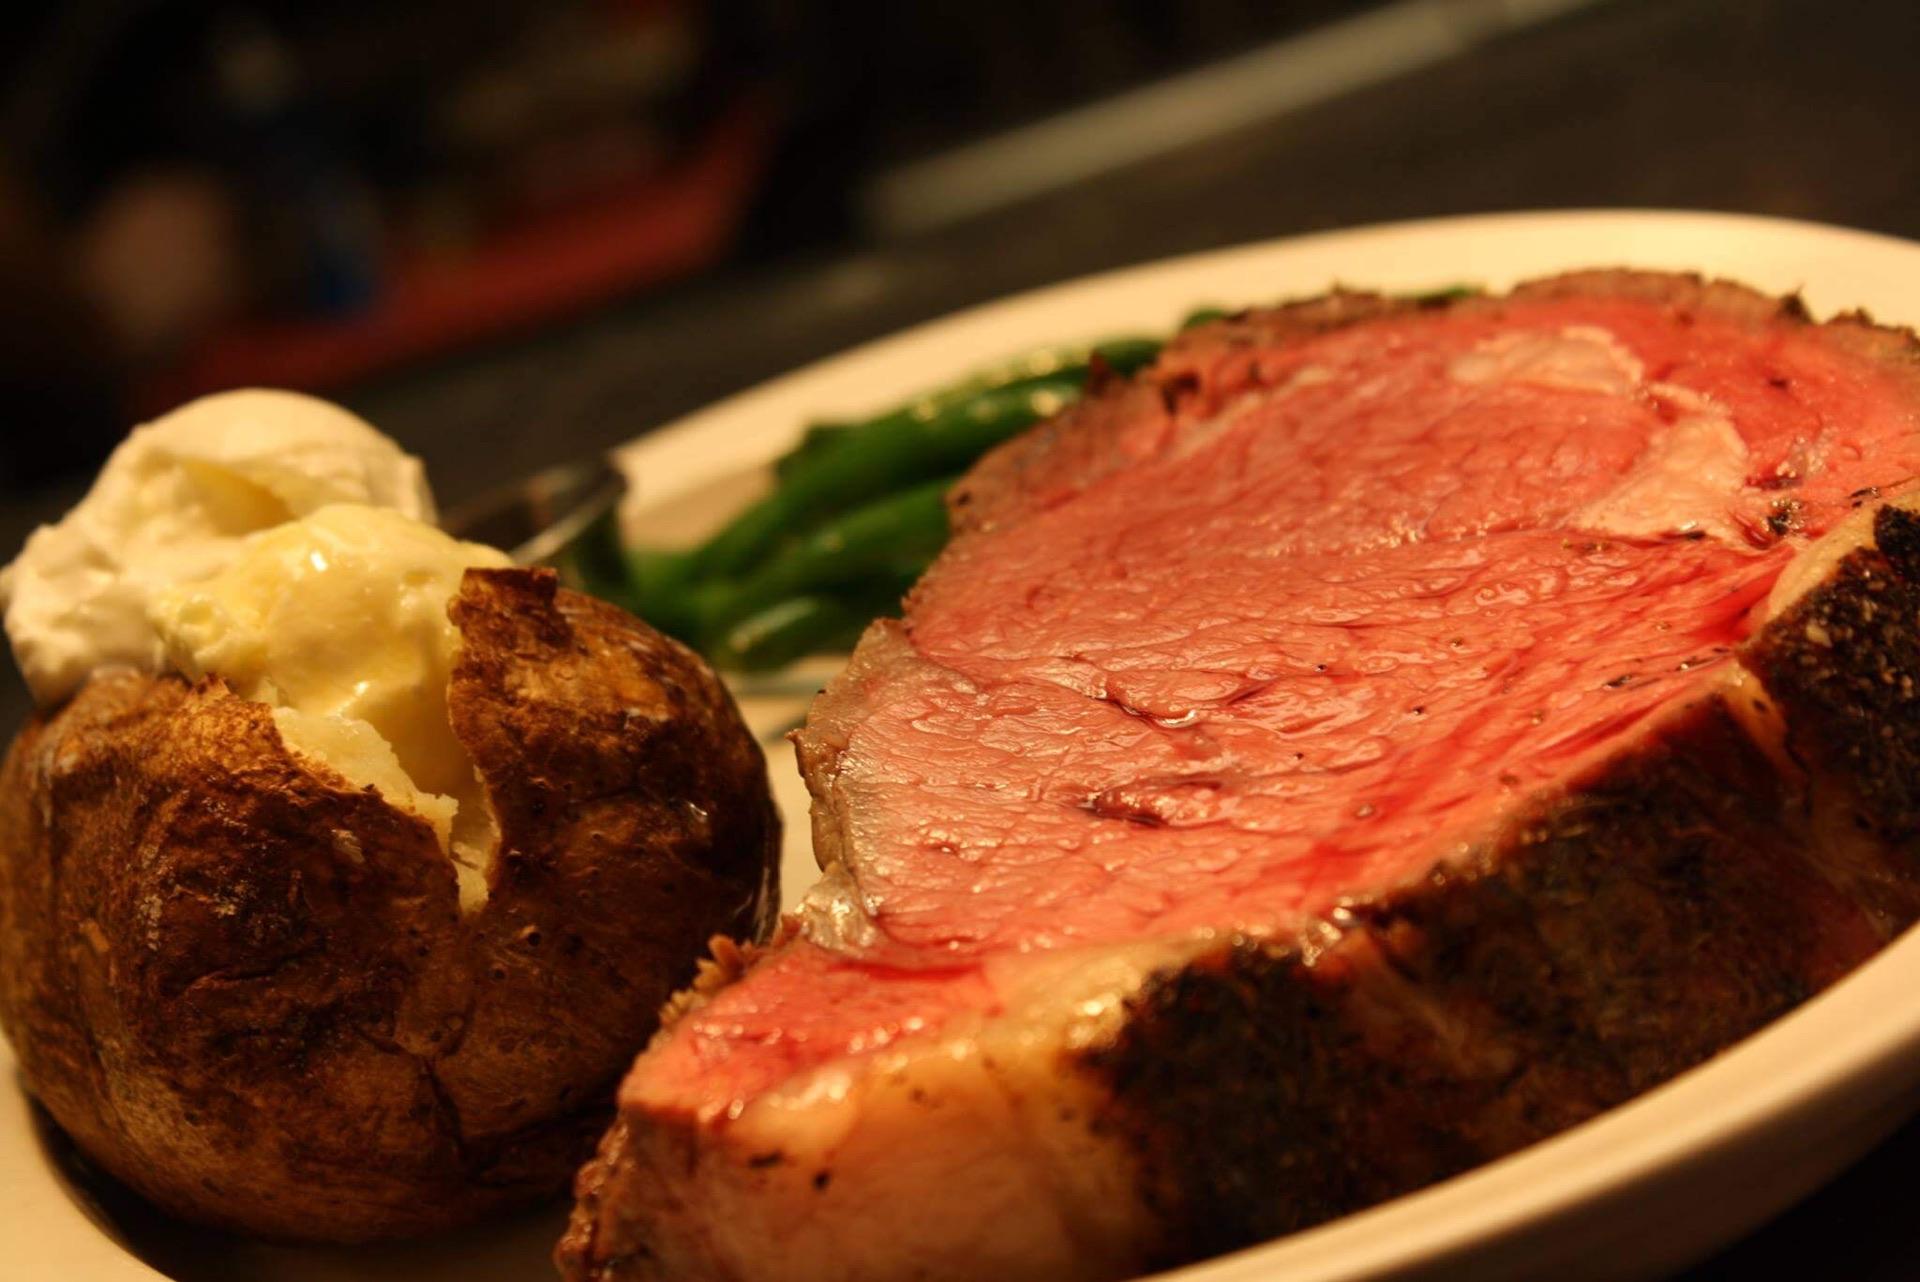 Steak and baked potato served at Olivia's Chop House, Jonesville